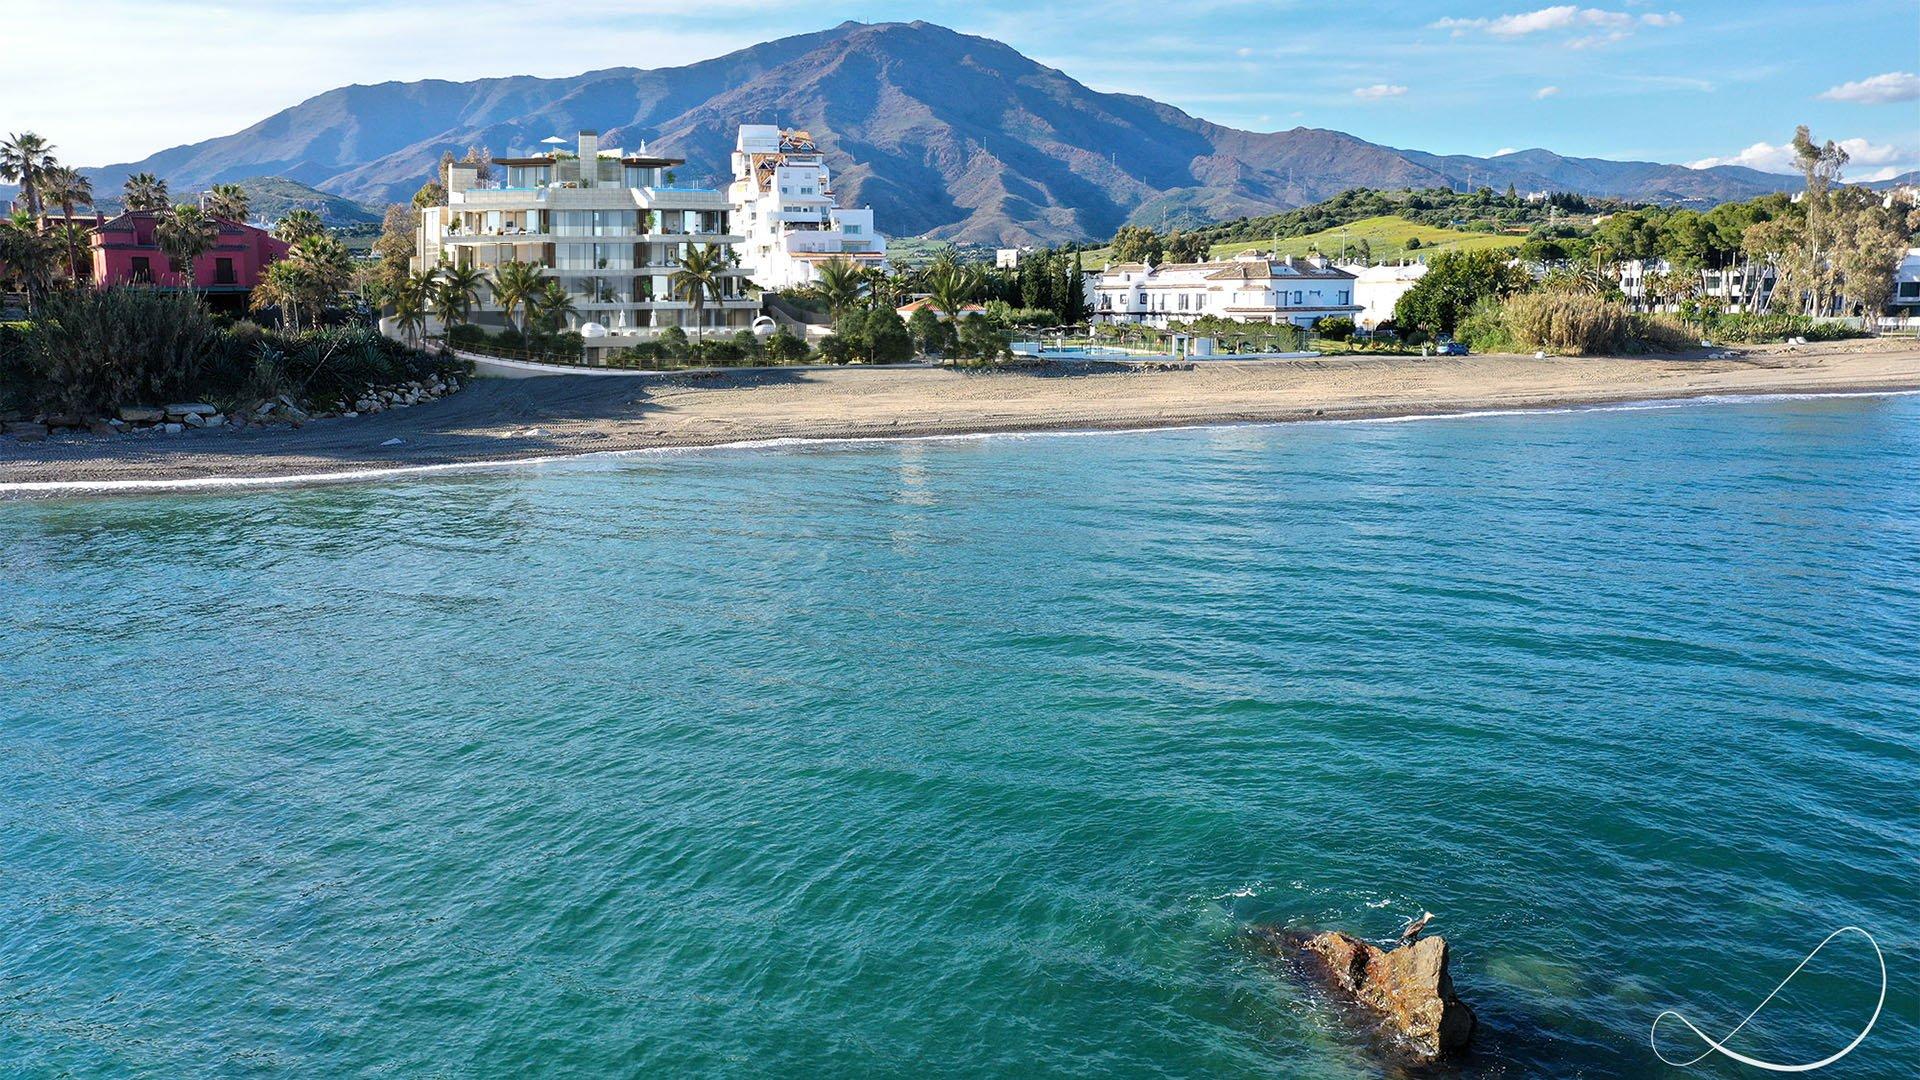 The Sapphire Estepona: A pearl at the beach of Estepona